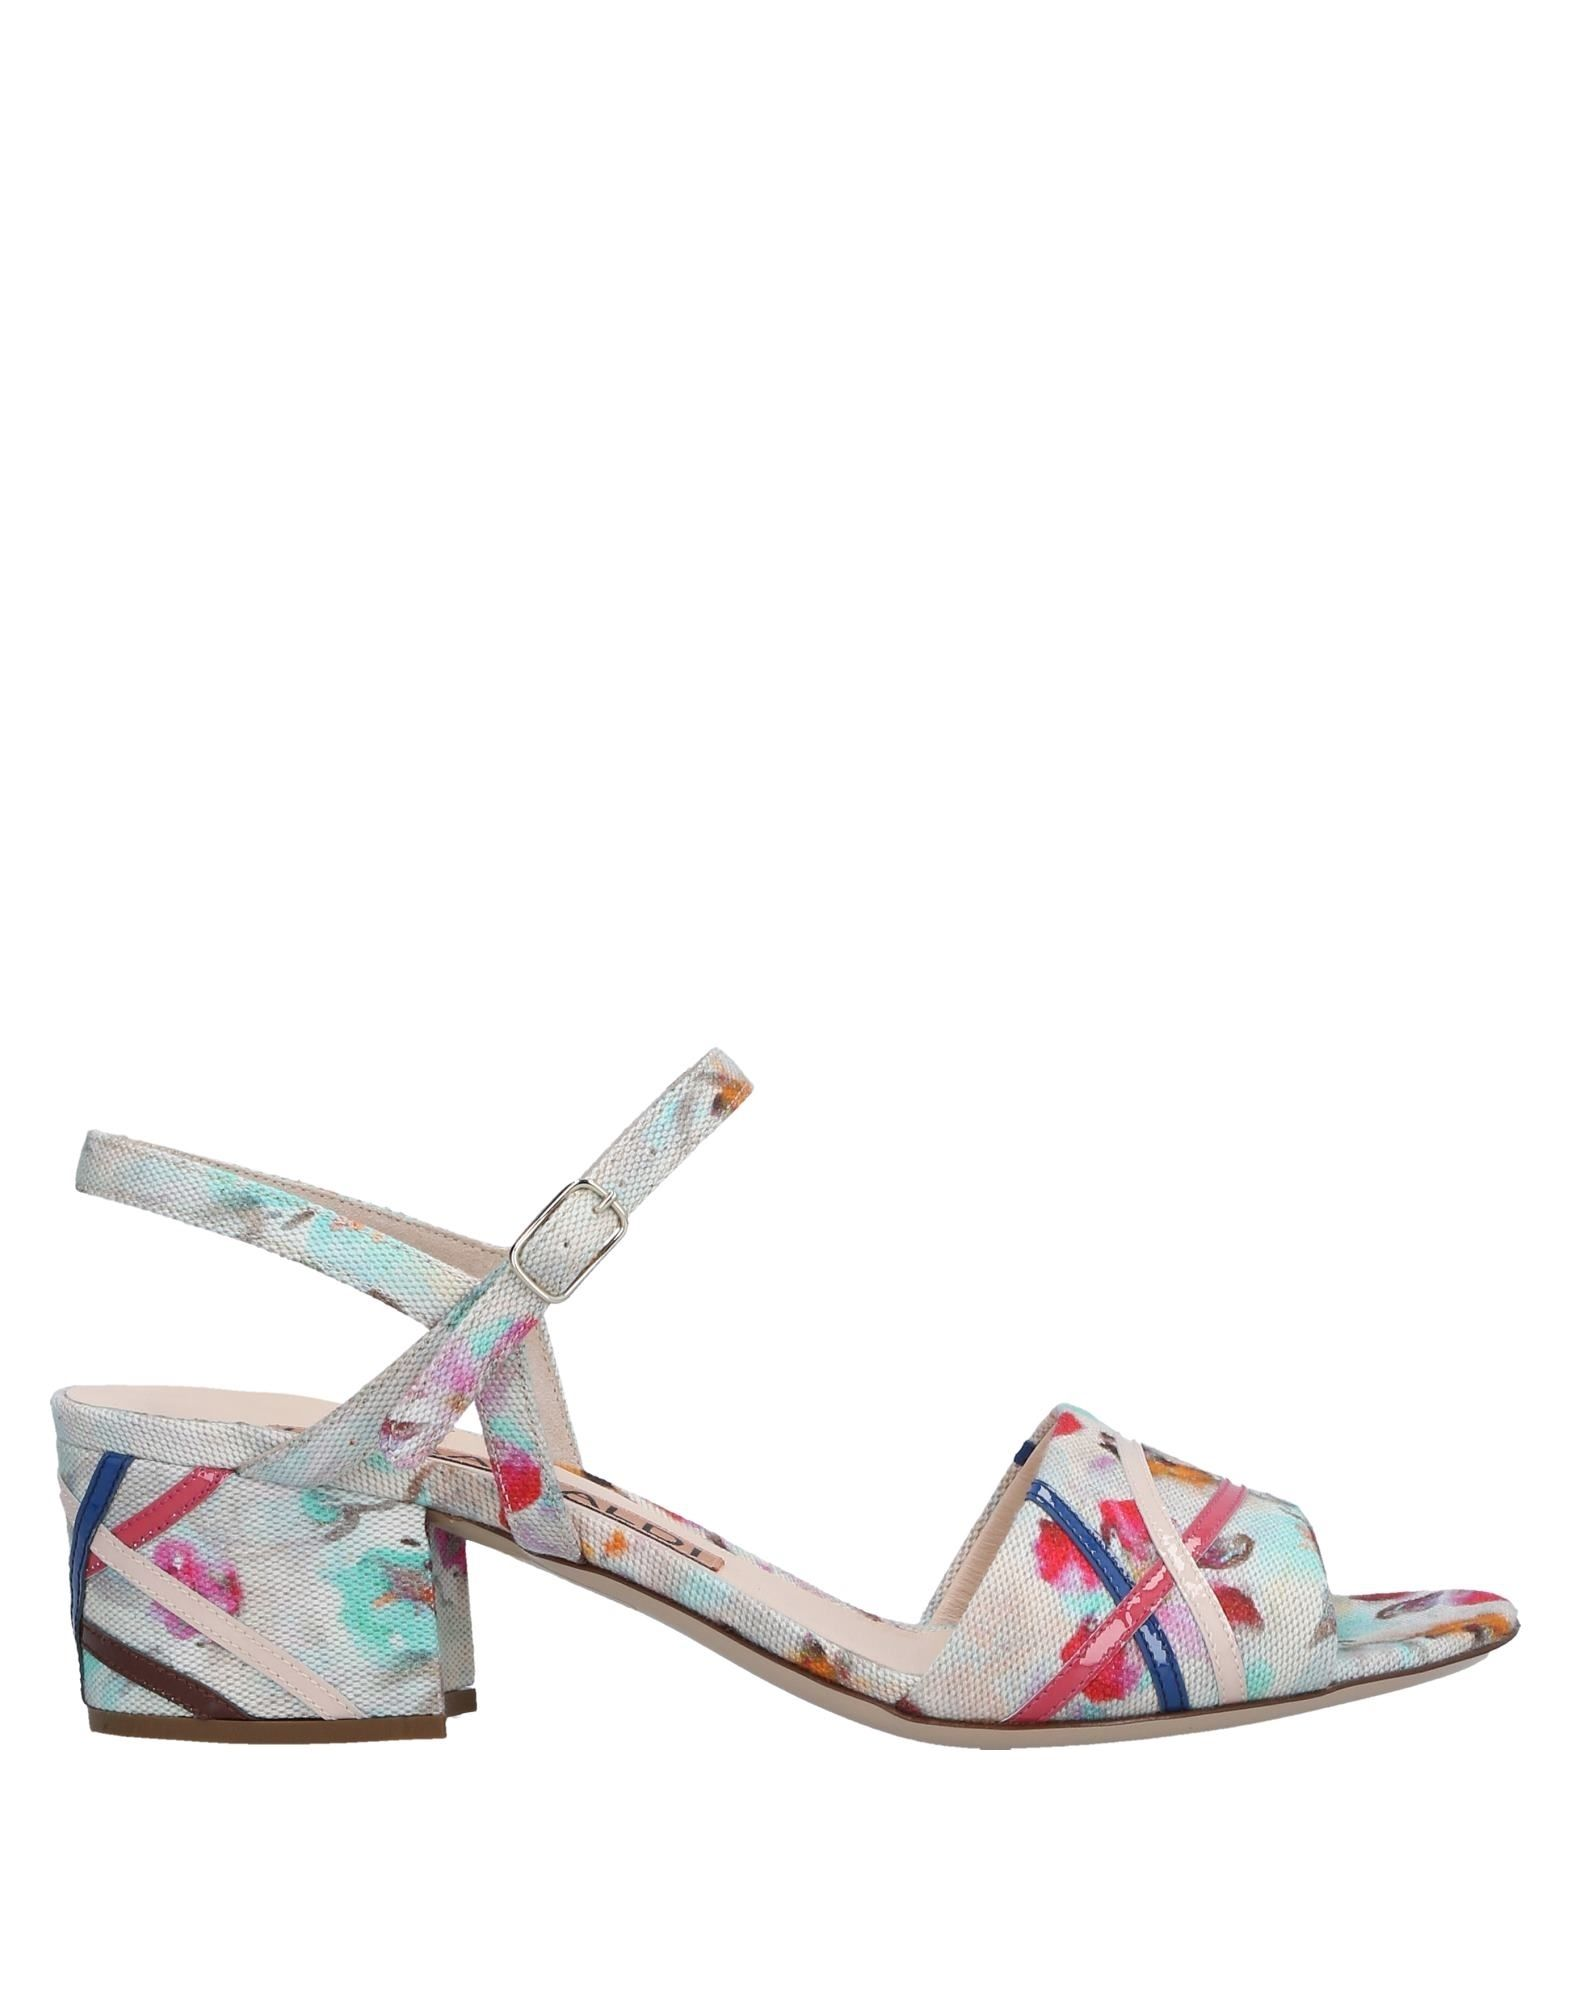 Lella on Baldi Sandals - Women Lella Baldi Sandals online on Lella  Australia - 11535529VC dd95a2